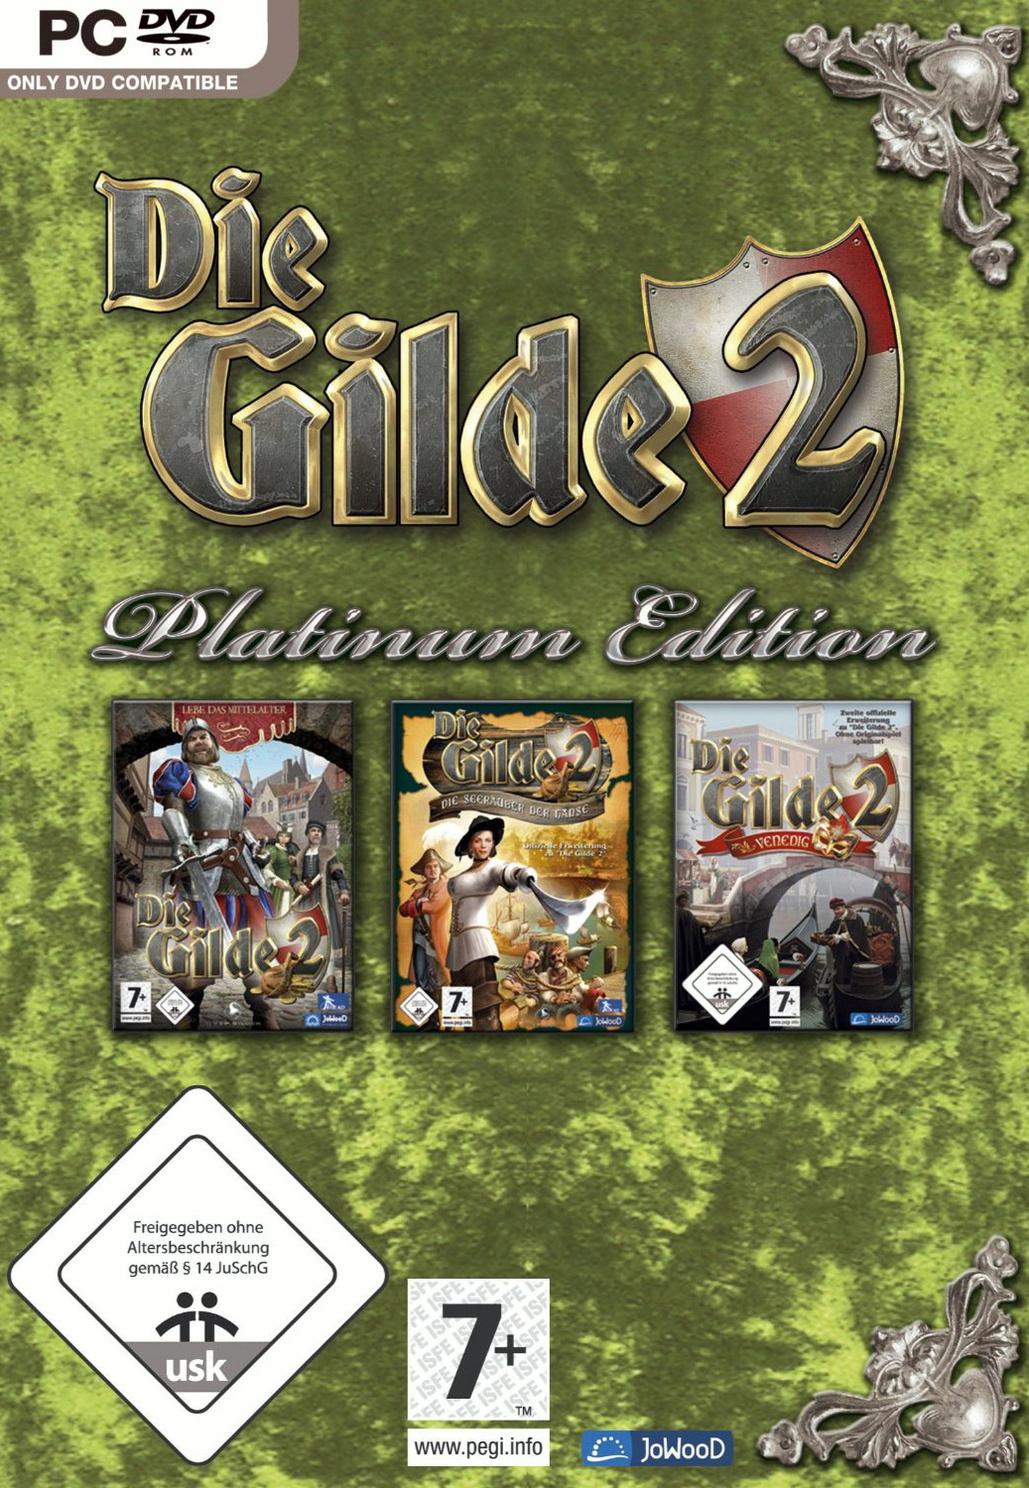 Die Gilde 2 [Platinum Edition]